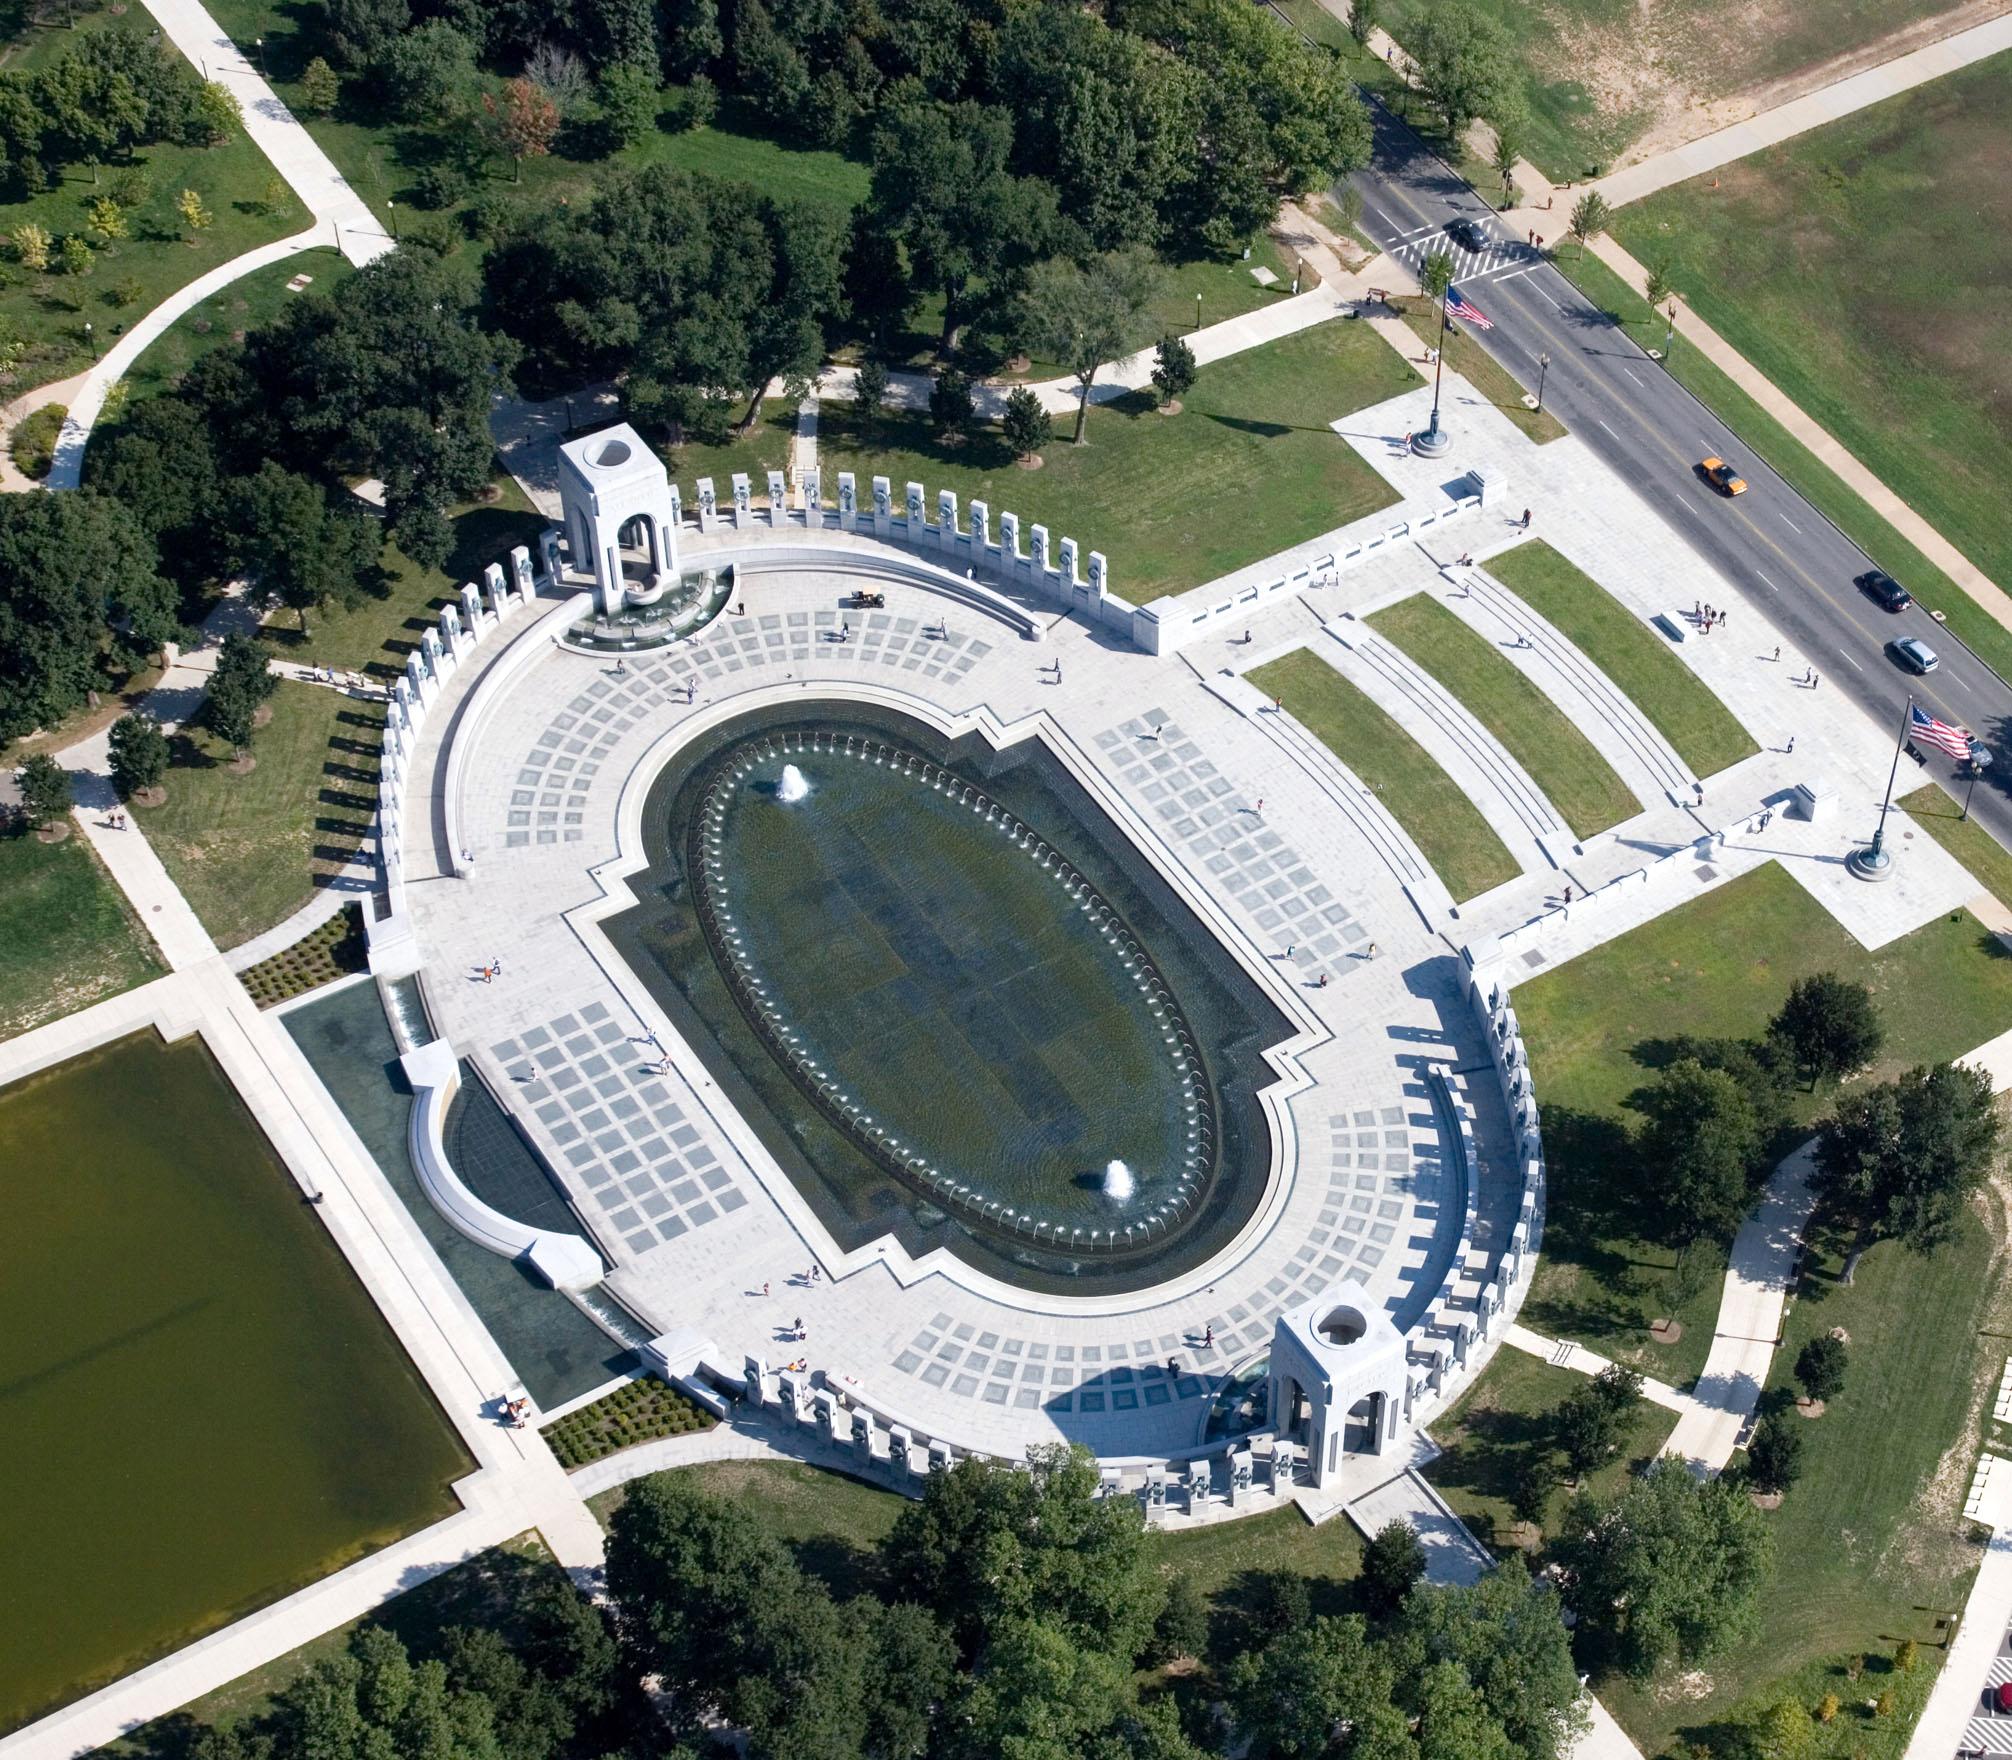 Aerial view of national world war ii memorialwww